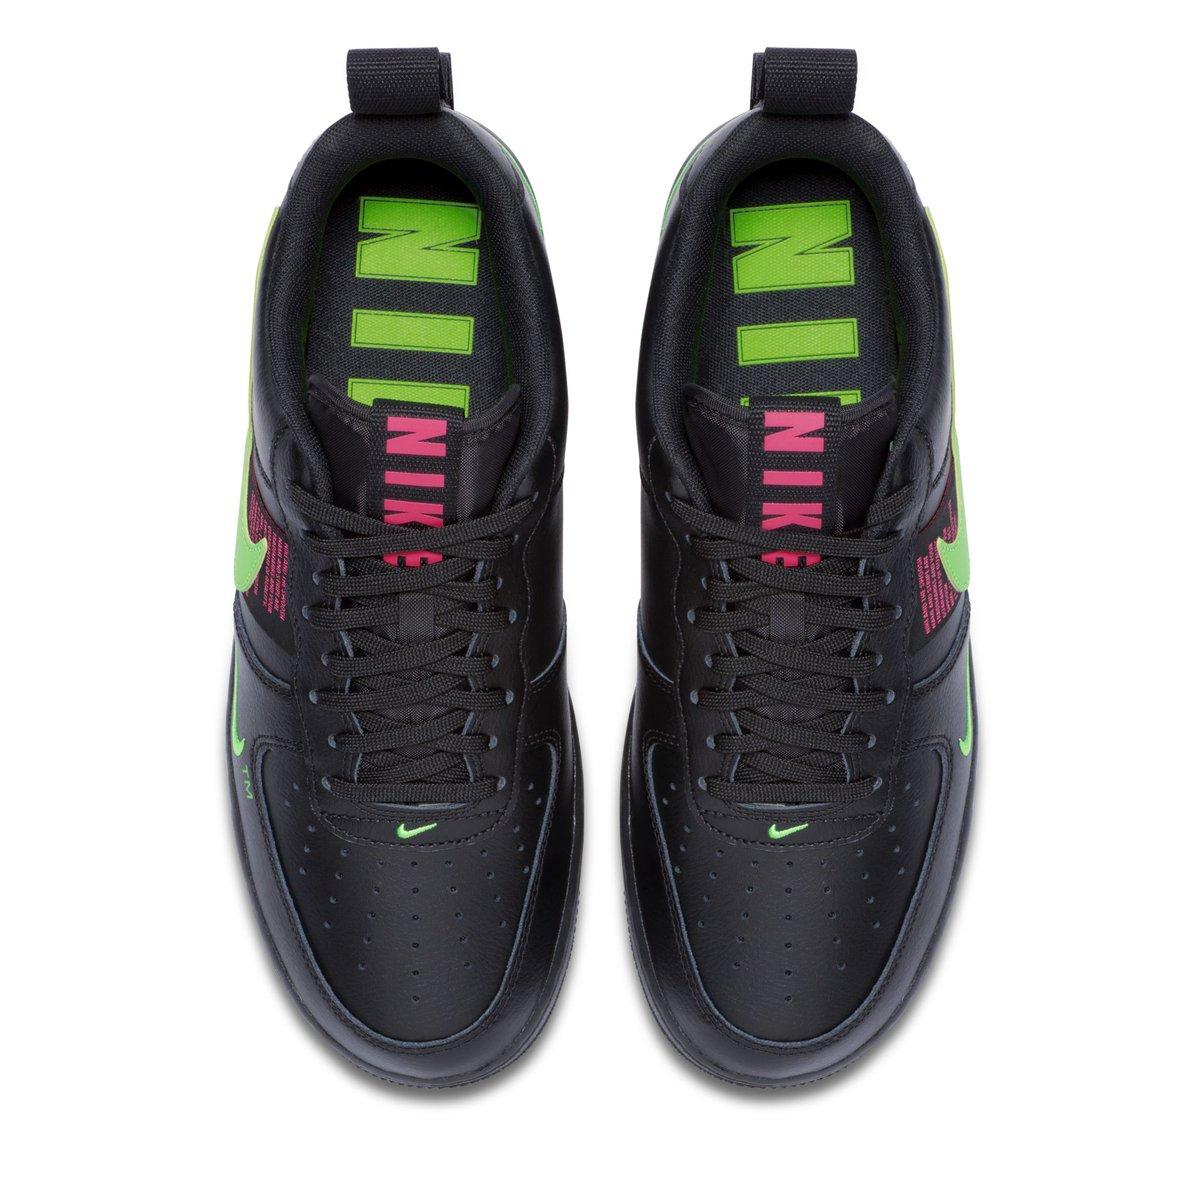 Nike,AF1,Air Force 1  买不起 OFF-WHITE 可以选它!解构 Air Force 1 带来新配色